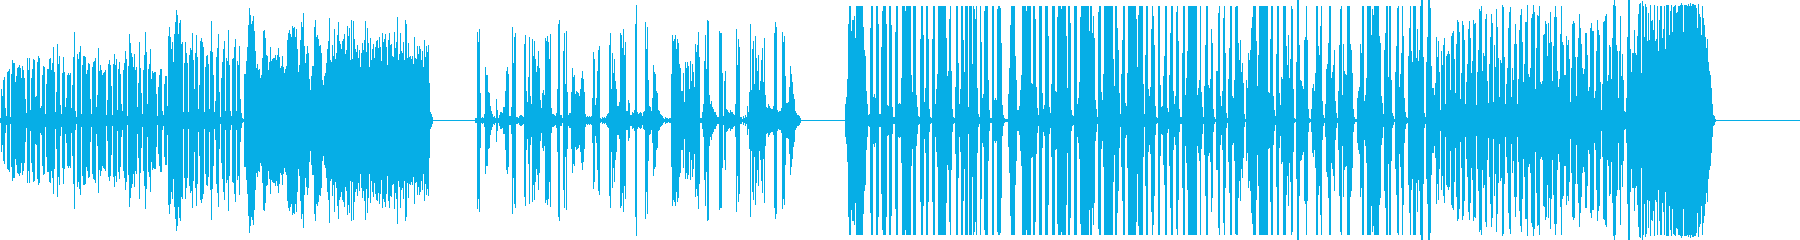 DJスクラッチパフォーマンス7-9の再生済みの波形